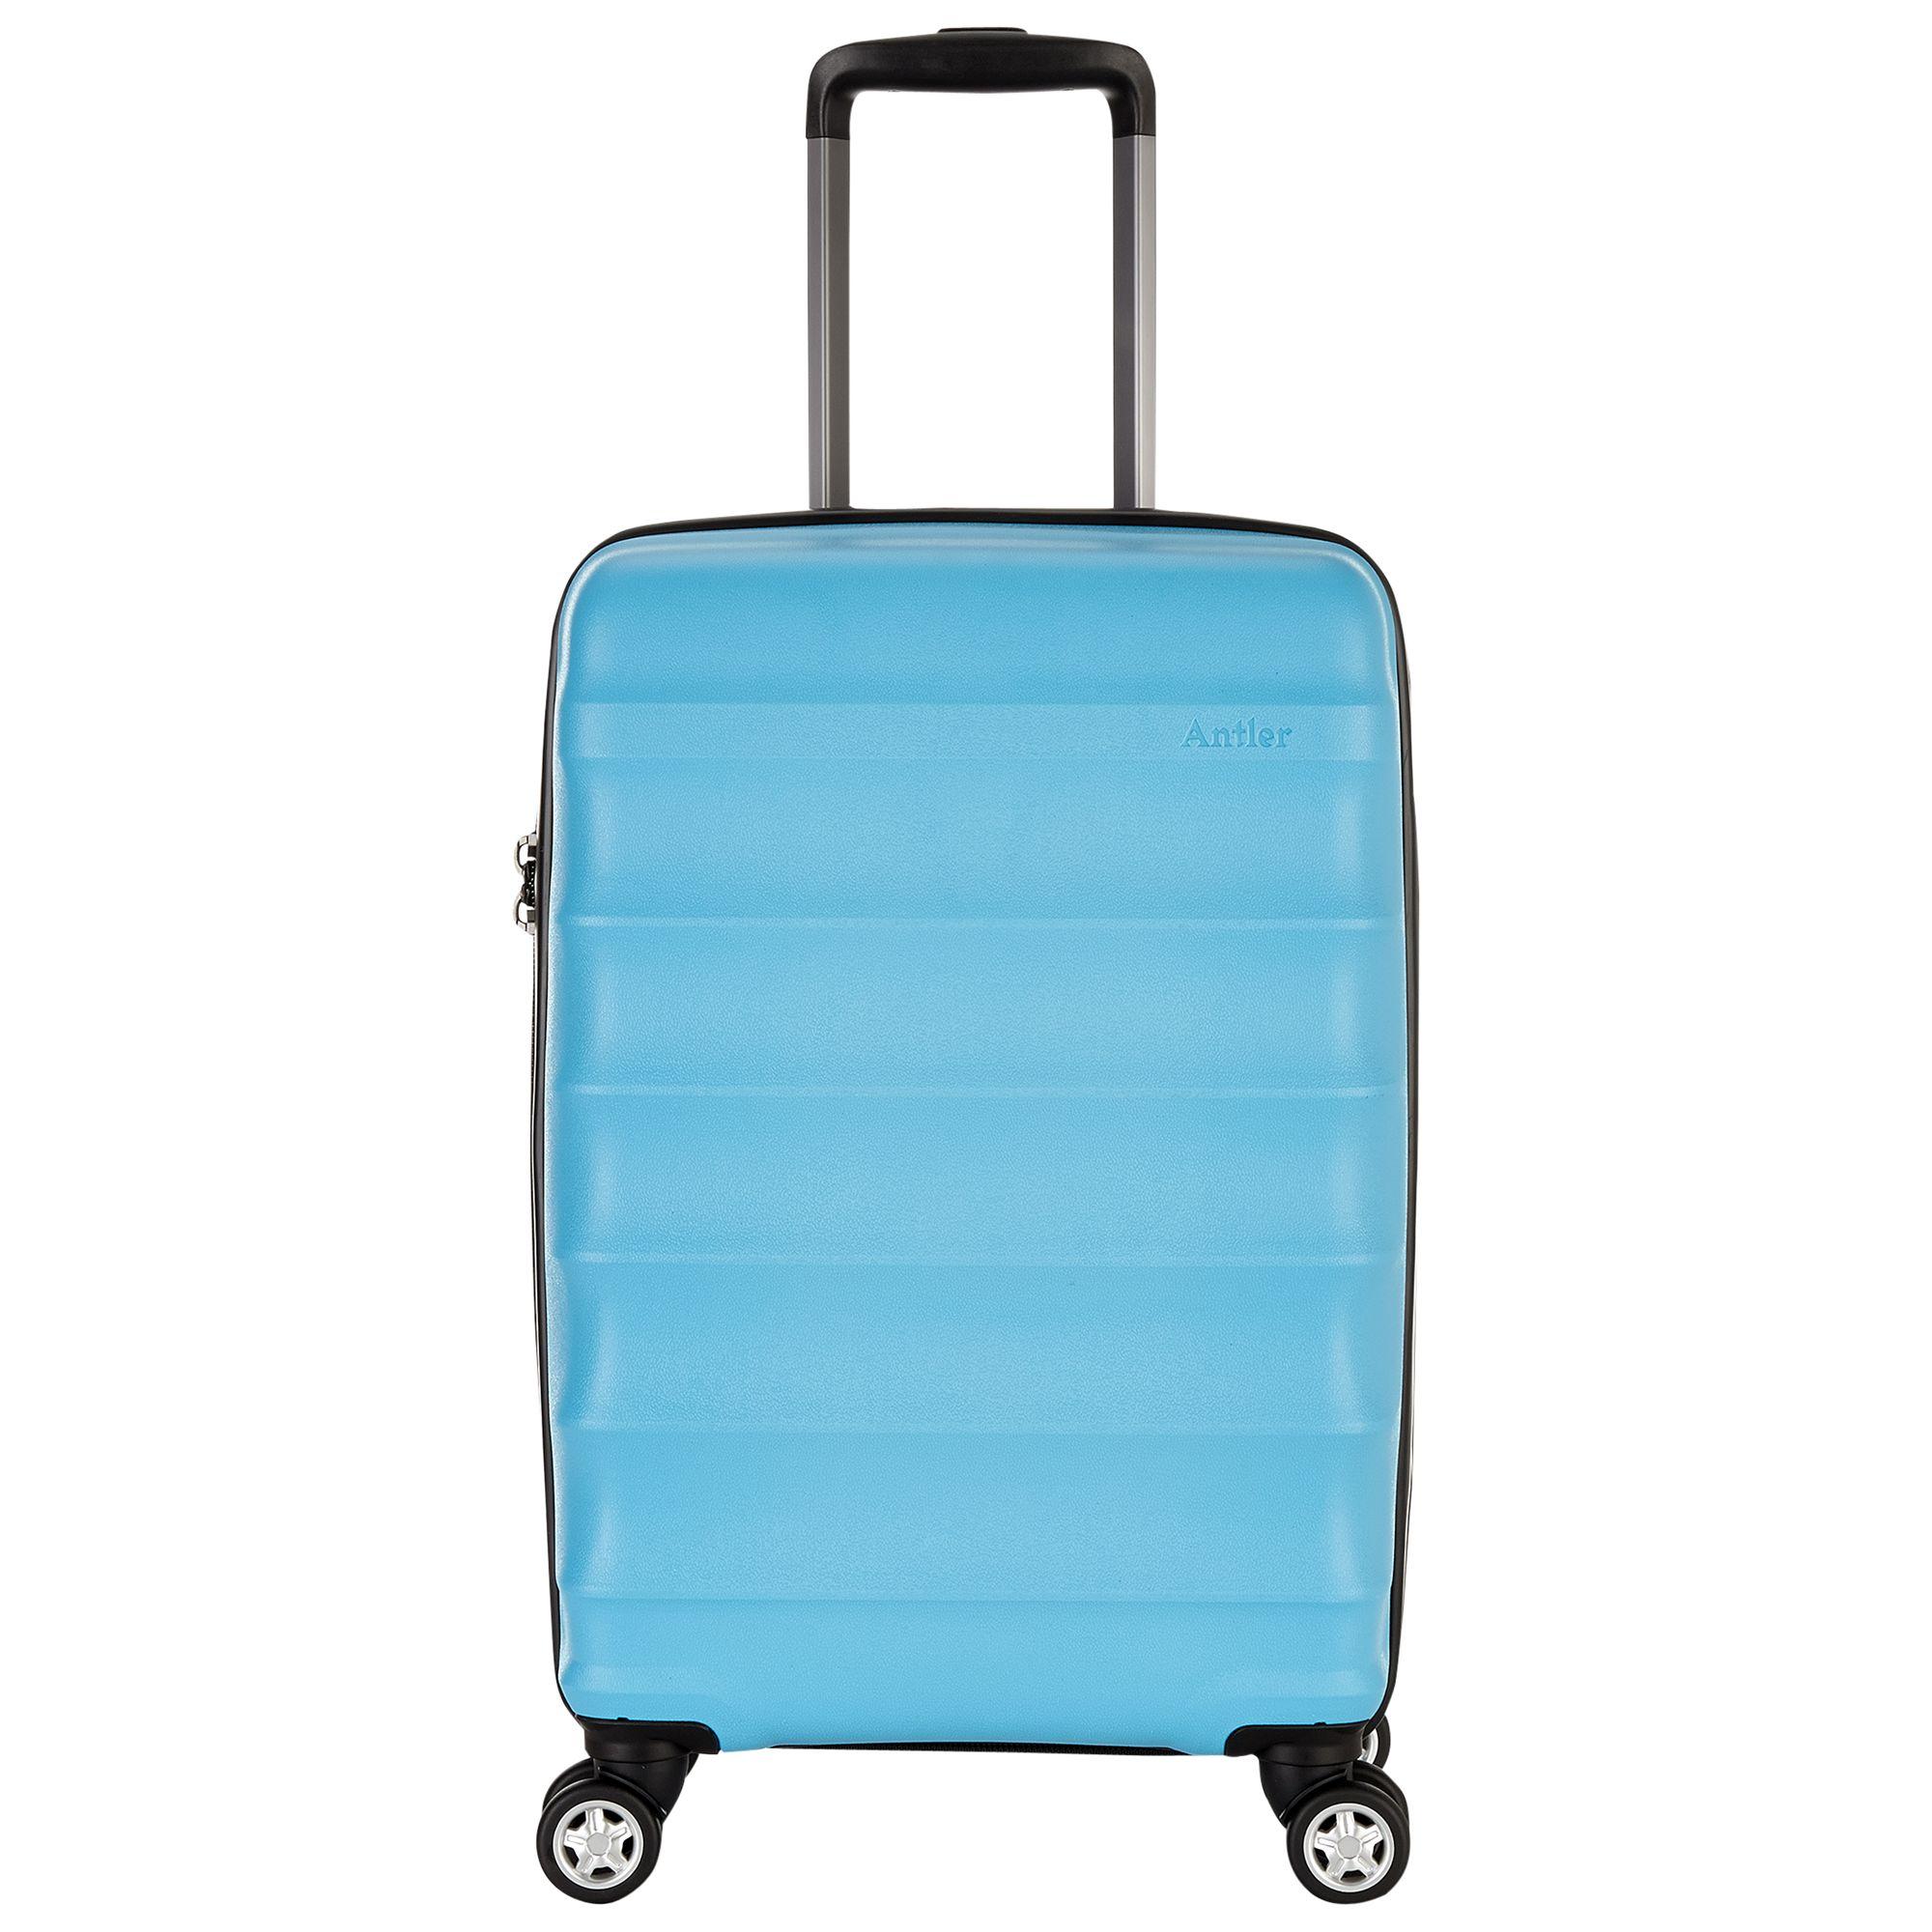 Antler Antler Juno B1 4-Wheel 56cm Cabin Suitcase